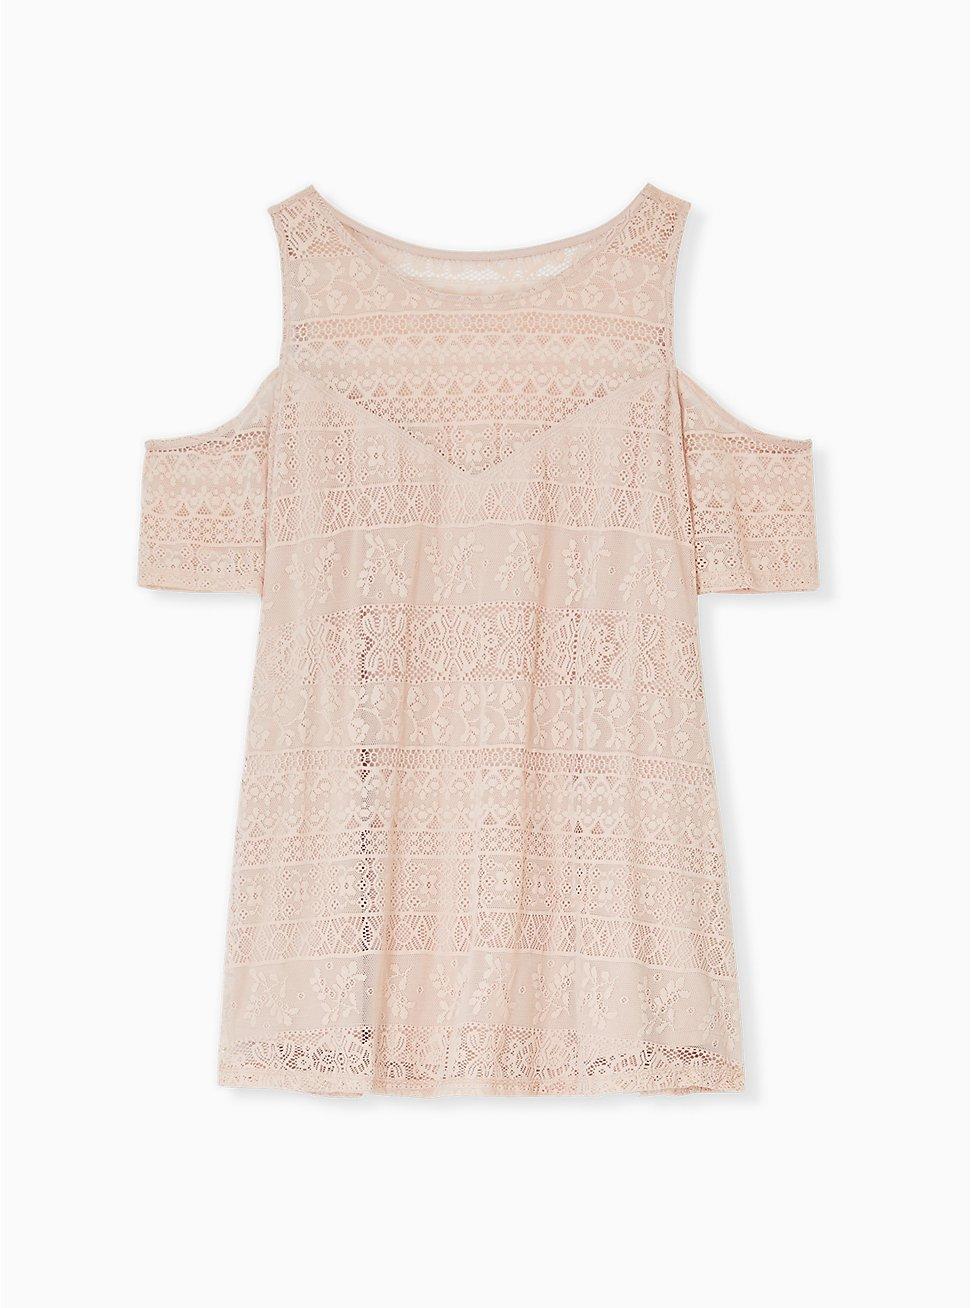 Pale Pink Lace Cold Shoulder Top, ROSE DUST, hi-res